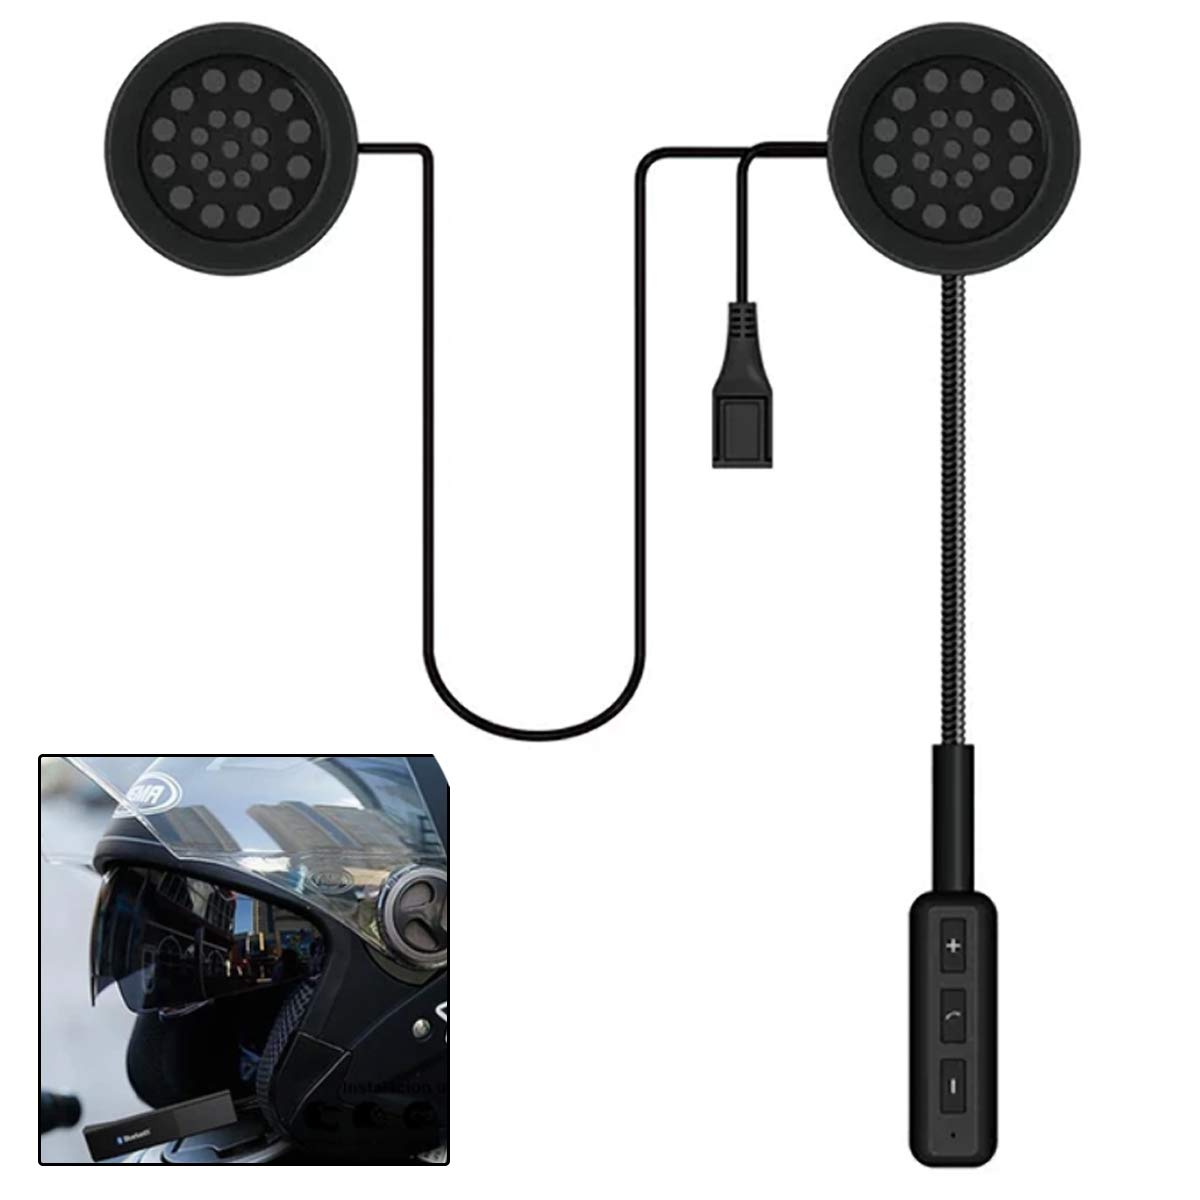 Phone Calls Music Maso 4.1 Motorcycle Headphone with Boom Microphone for Riders Intercom Helmet Bluetooth Headset Interphones